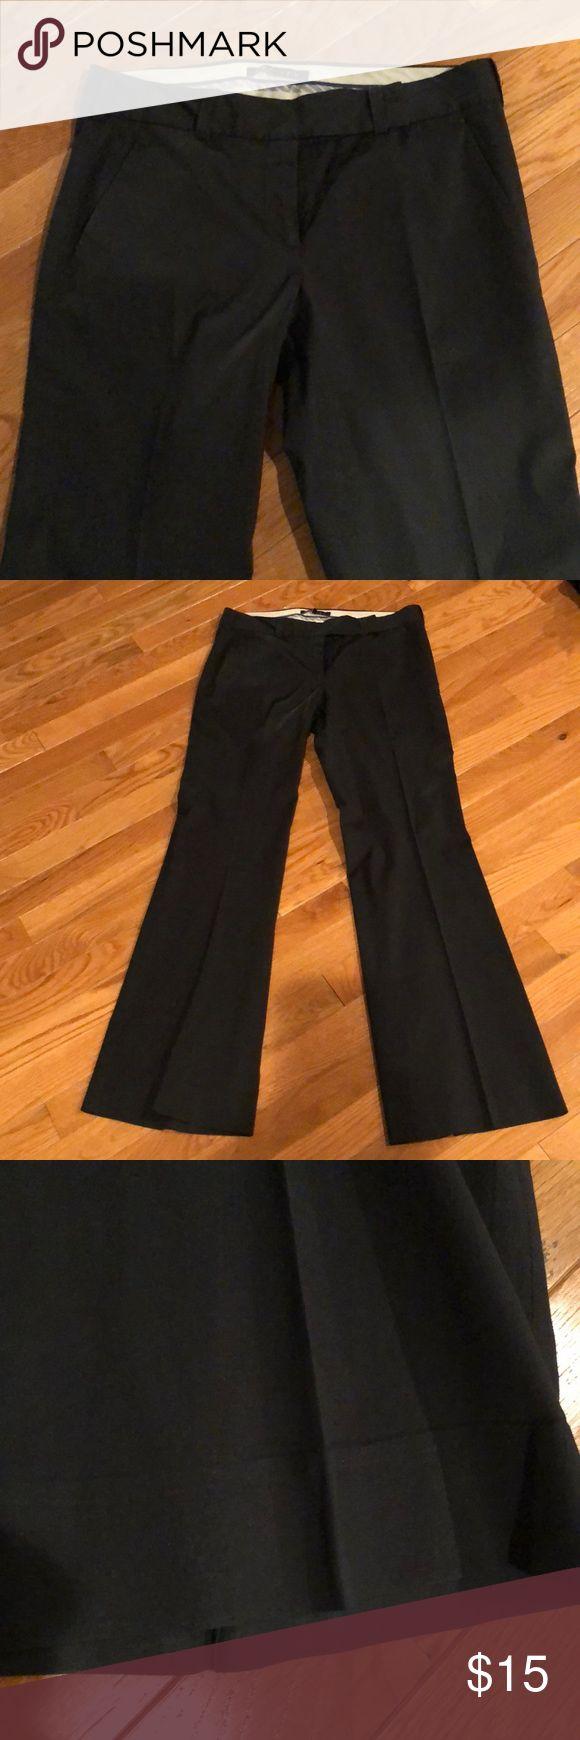 Theory pants Good condition no back pockets Dress pants Theory Pants